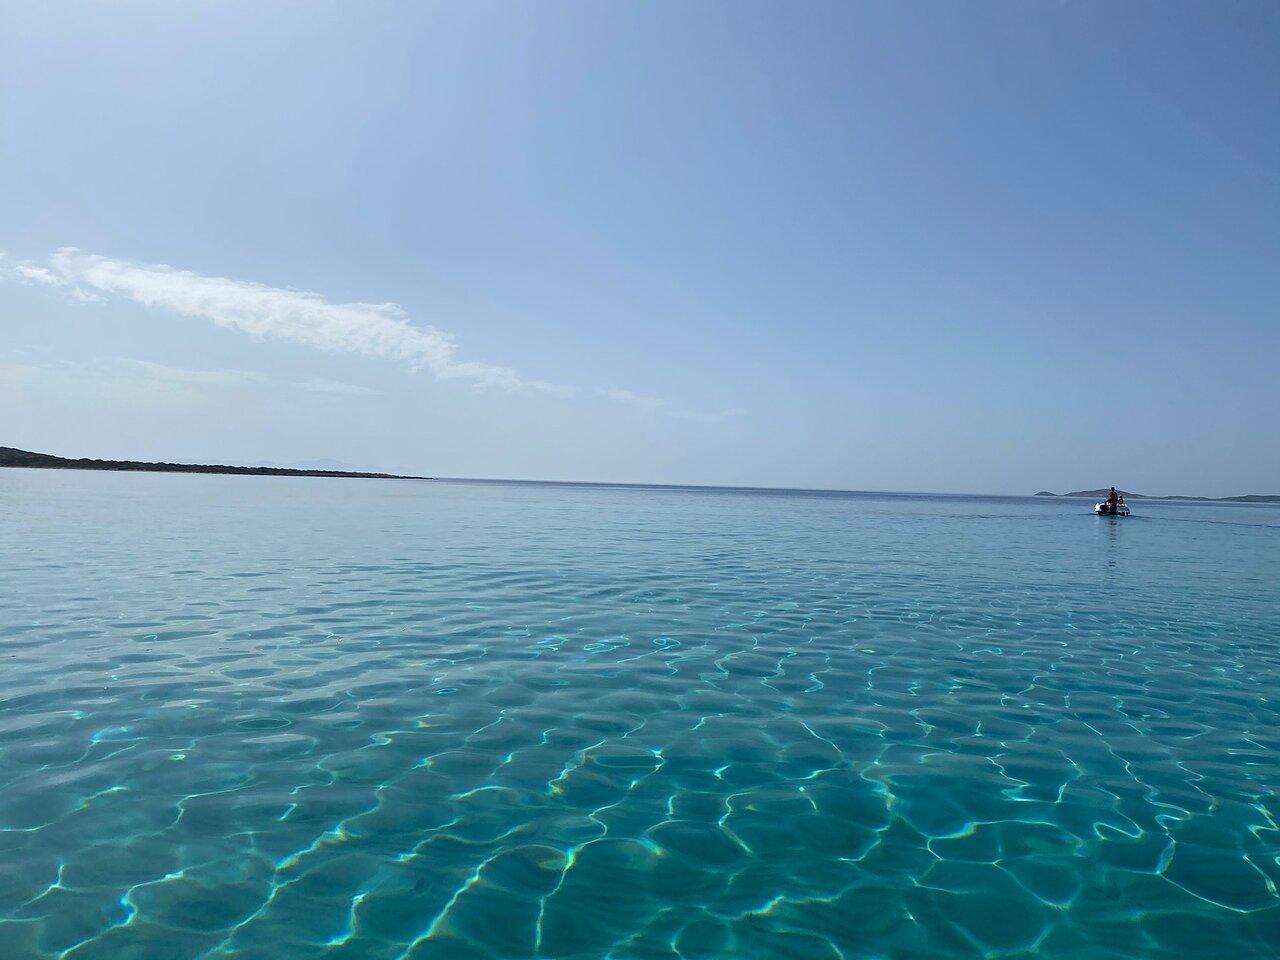 Lagune hannover blaue Blaue Lagune